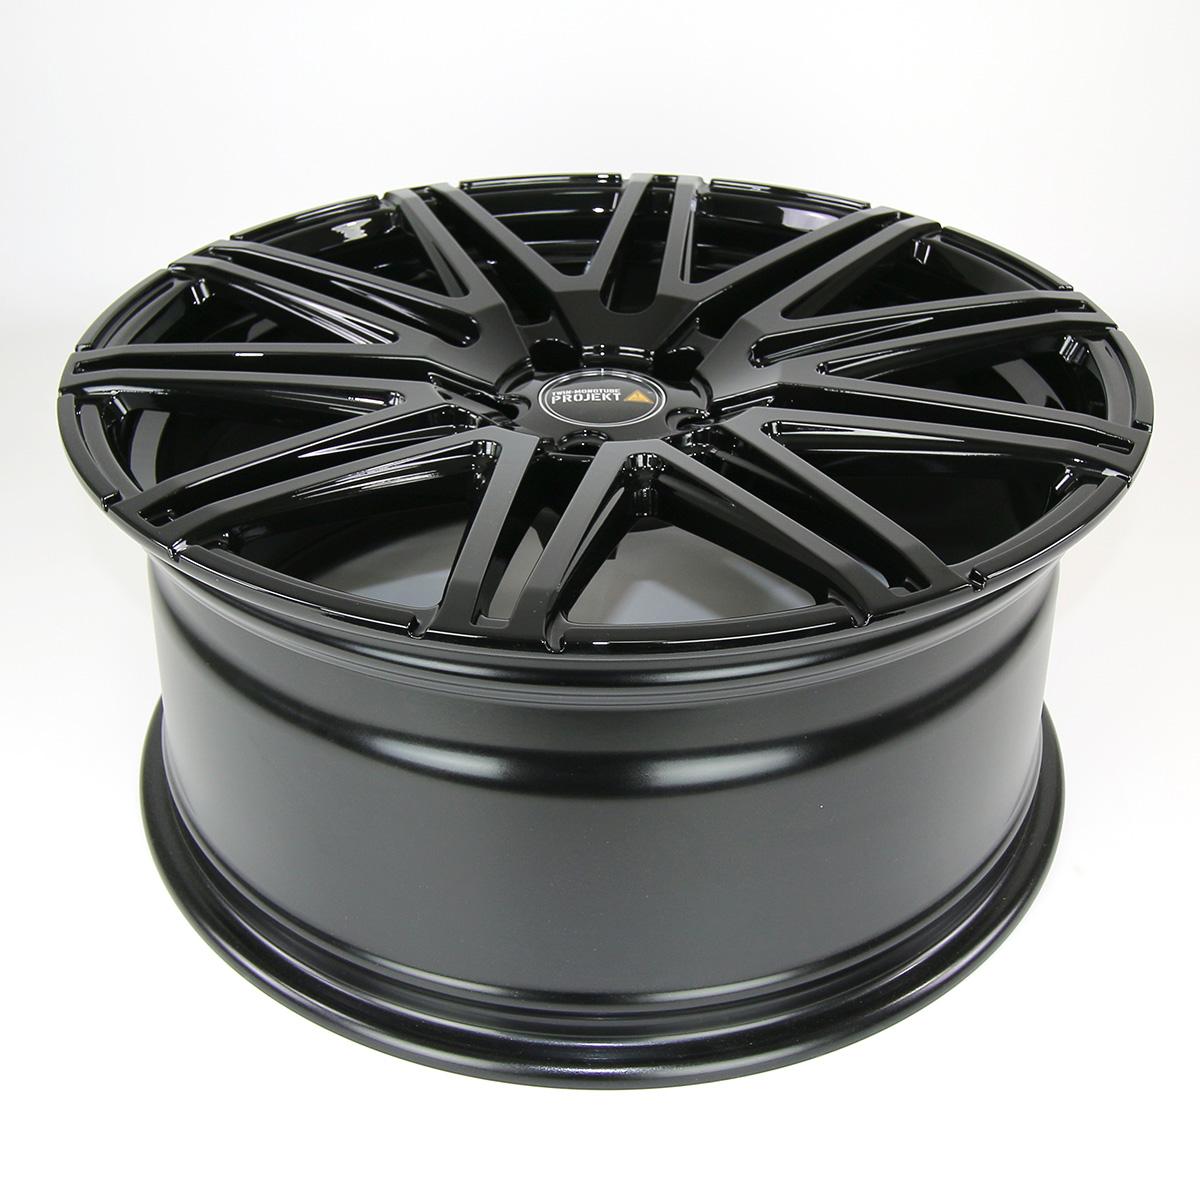 2x Twin Monotube Projekt Felge 9x20 ET40 für Audi A4 8K/B8 konkav